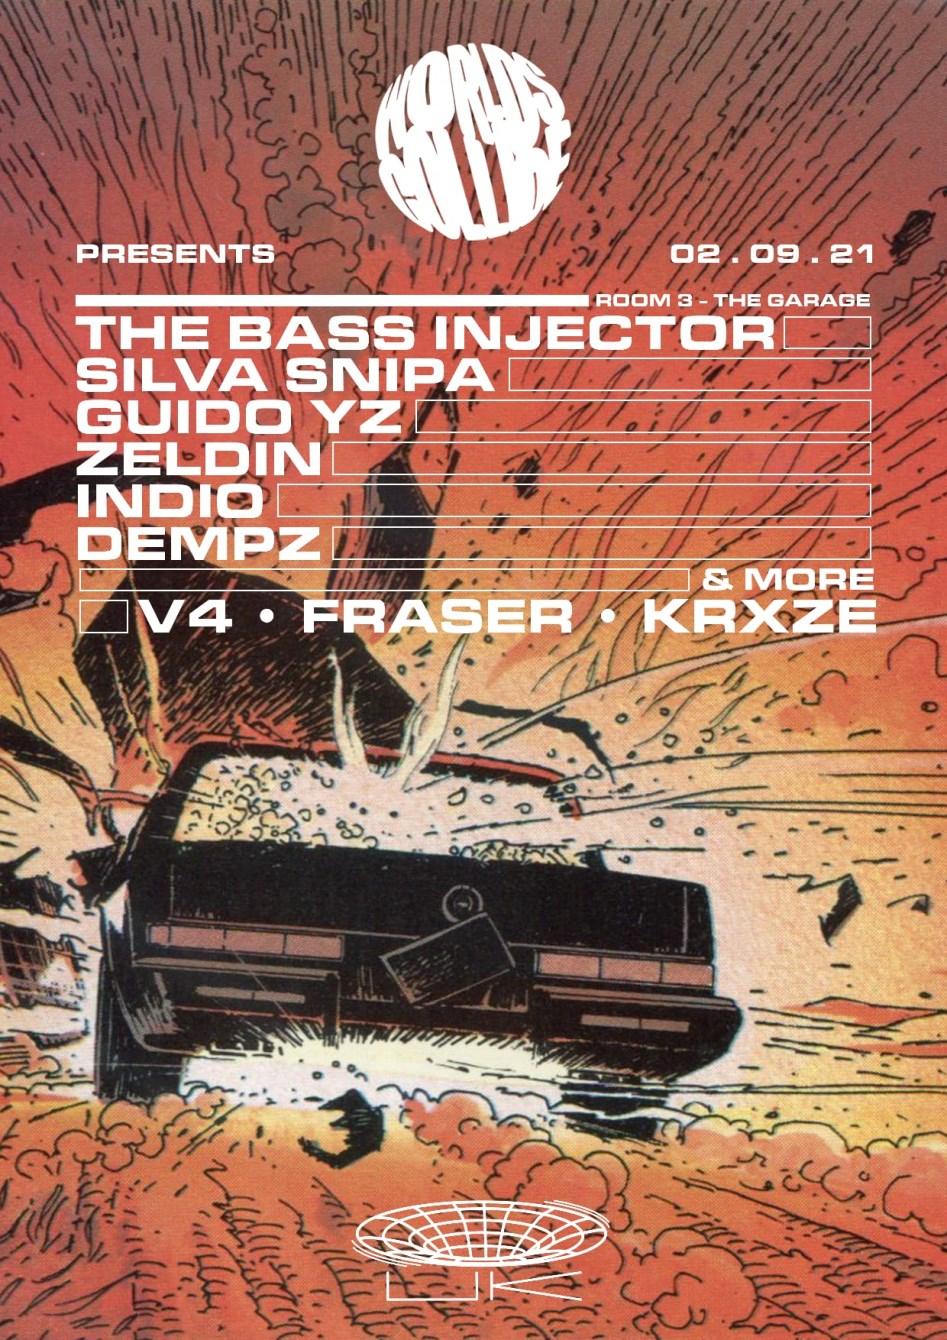 Worlds Collide - Darkzy, Mandidextrous, MPH, Bornonroad DJs, Critical Impact, DJ Hybrid & More - Flyer back